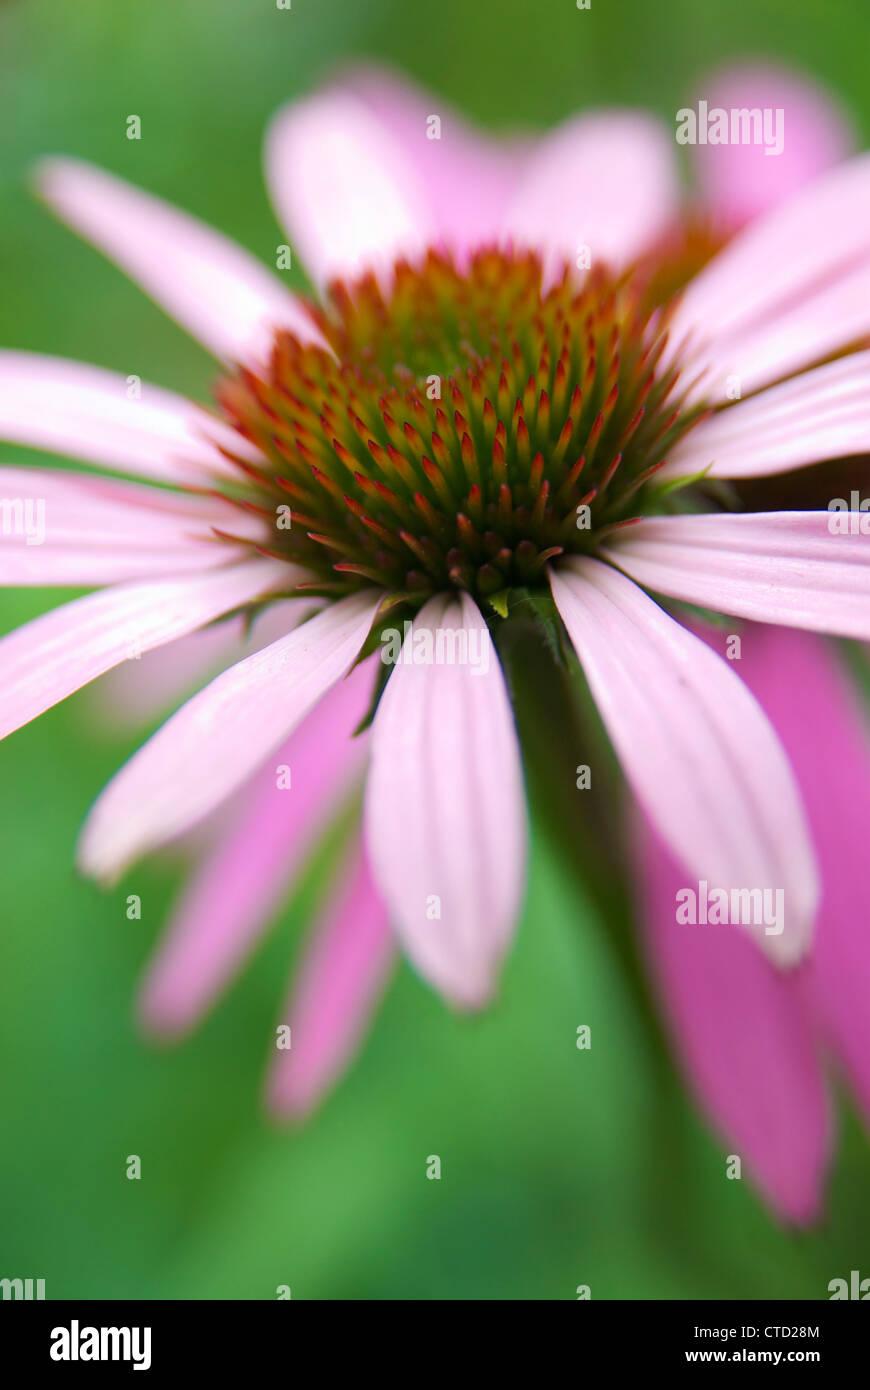 Flower head of an Eastern purple coneflower (Echinacea purpurea). - Stock Image